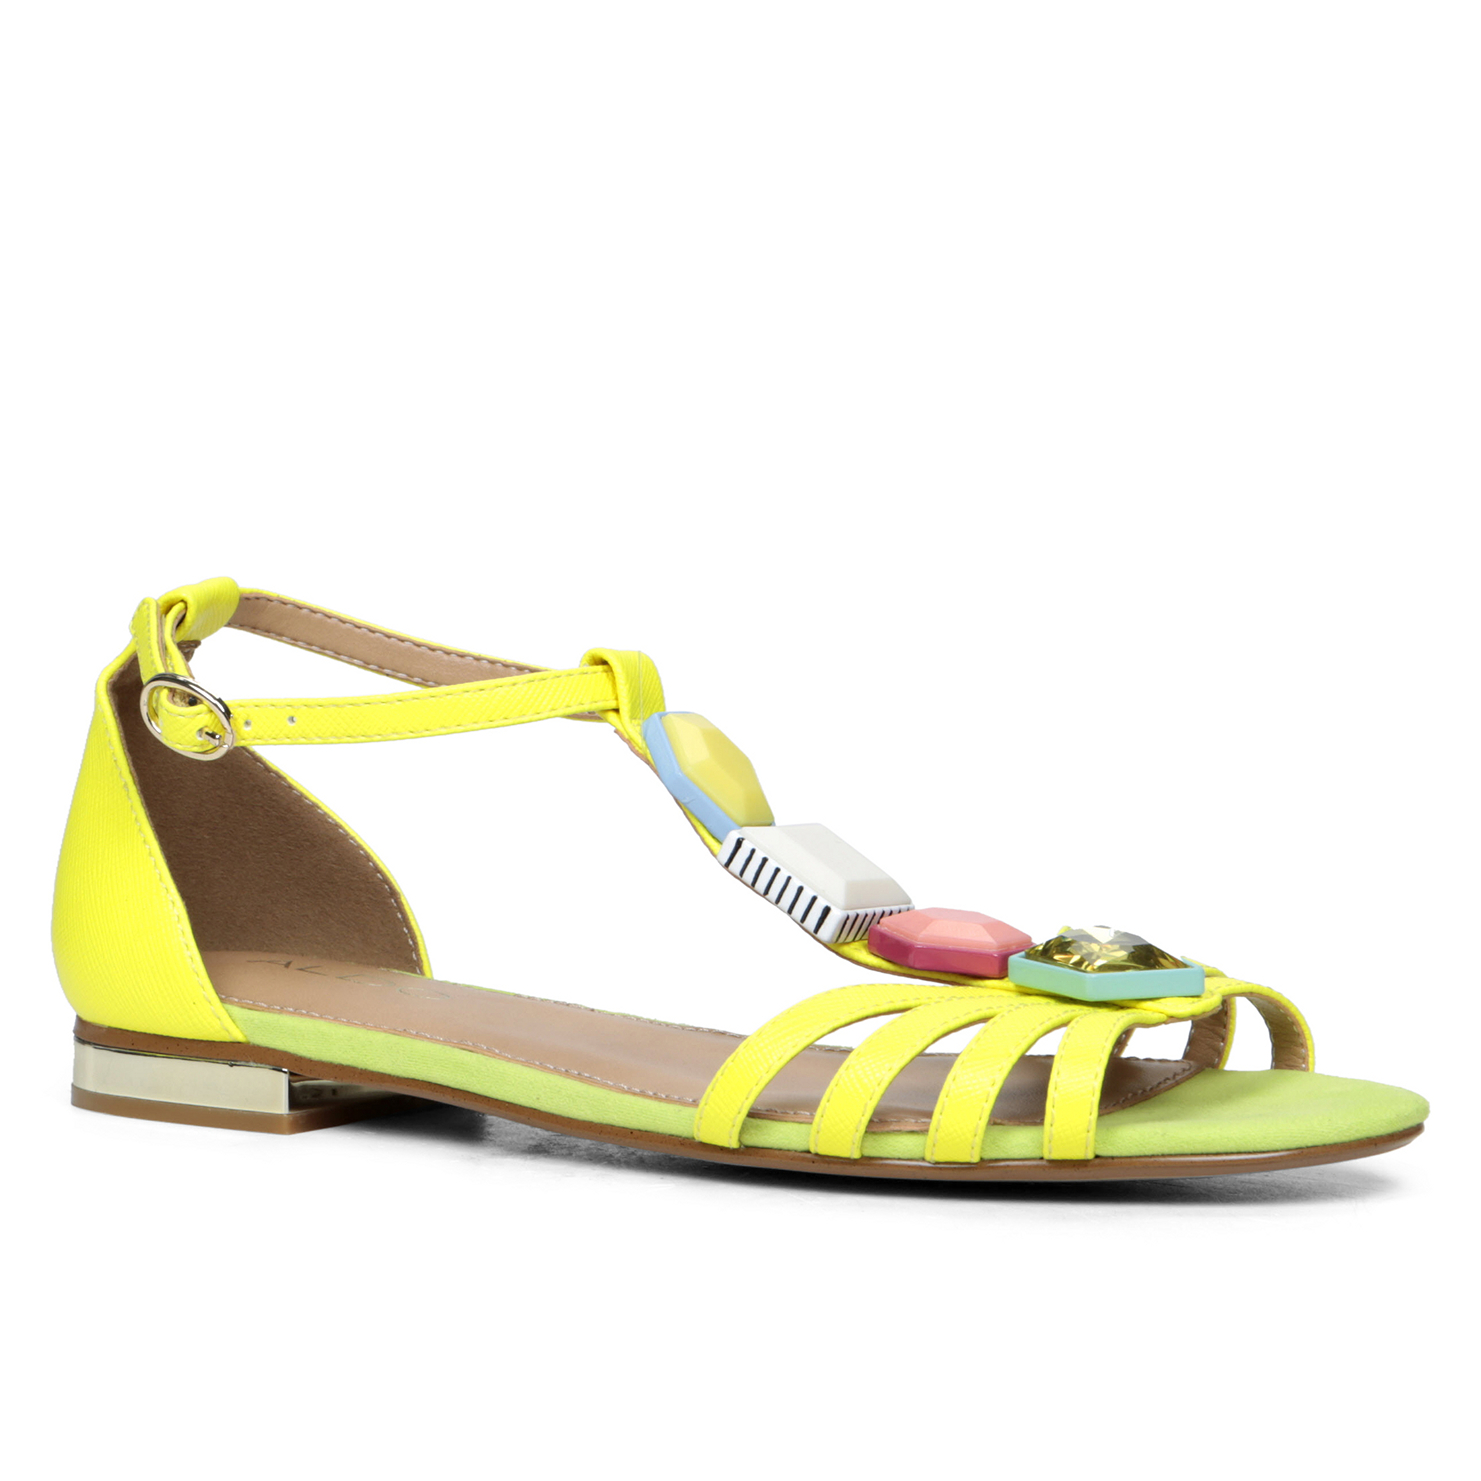 Clarks Lilia Flat Shoes